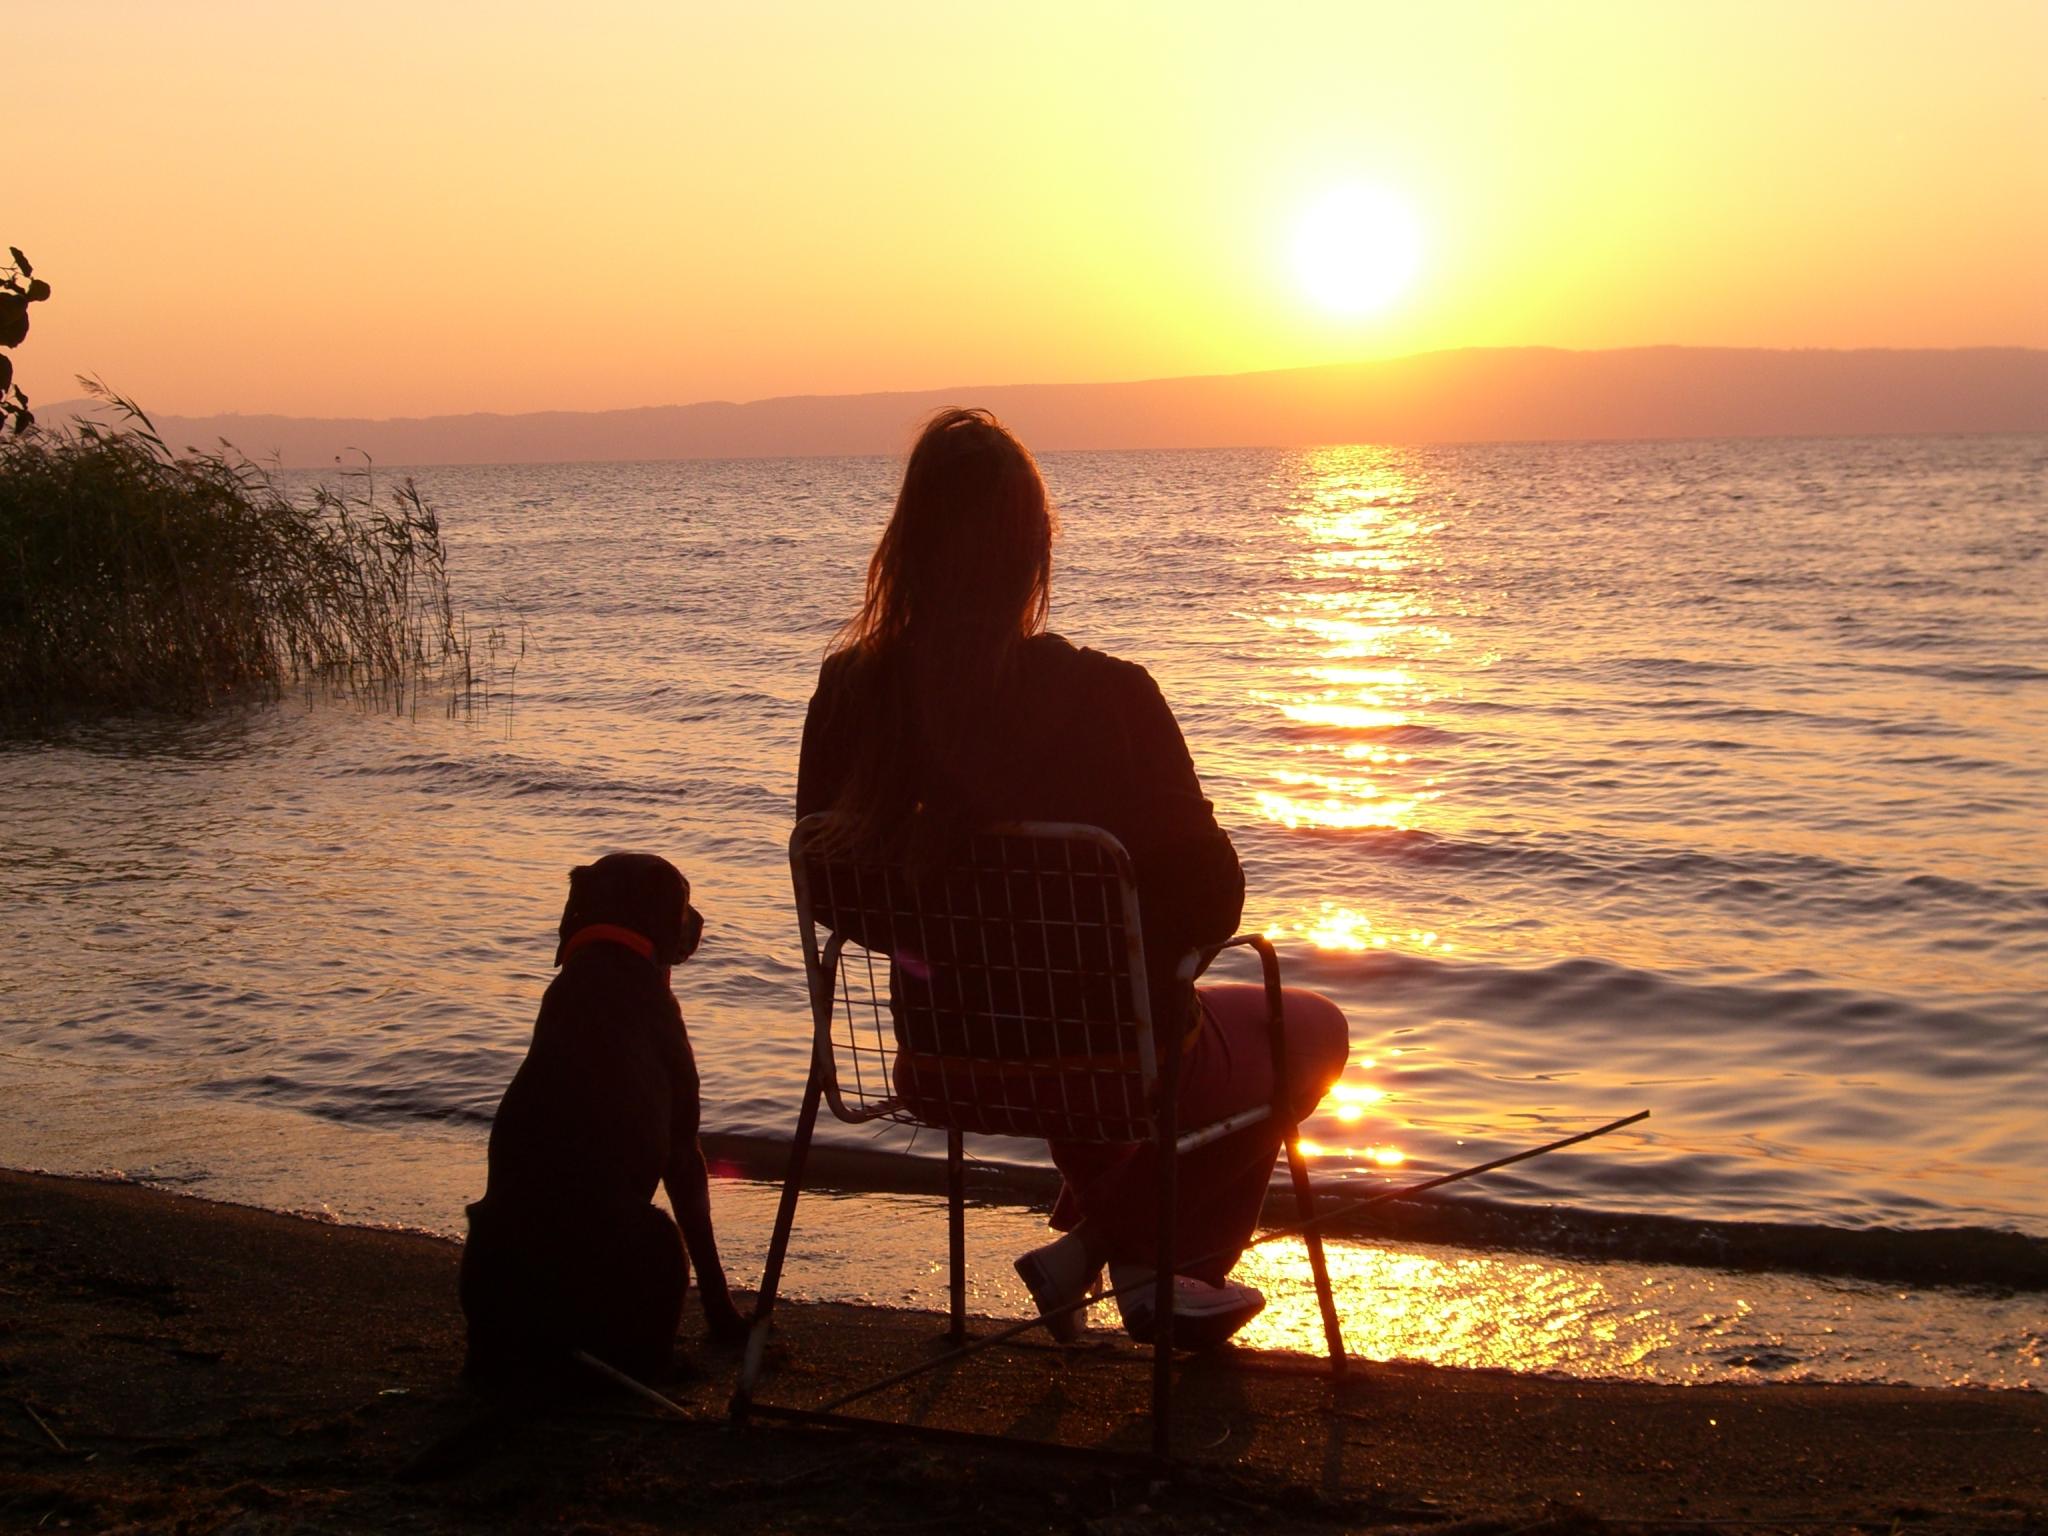 Frau mit Hund am See, Sonnenuntergang, Michaela Seul und Luna bei Sonnenuntergang am See, flipper-privat.de